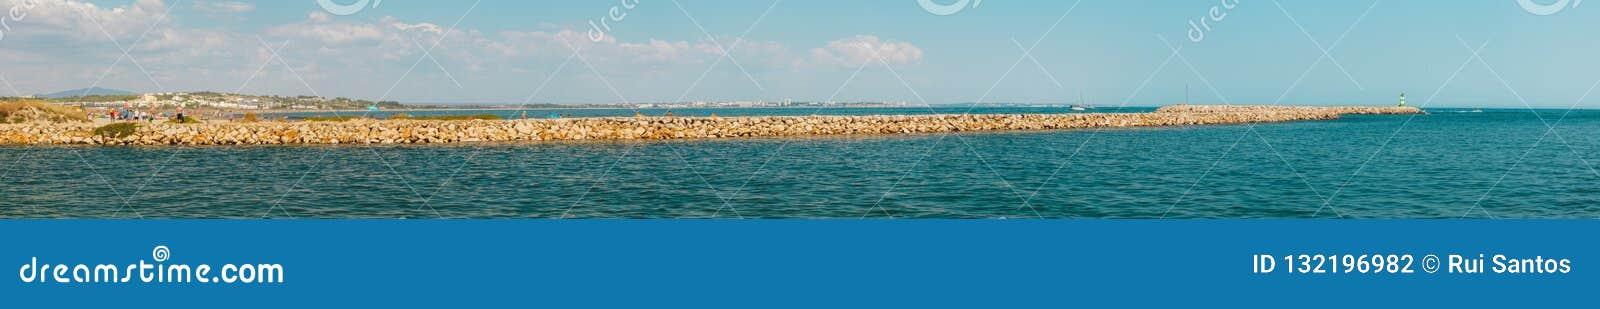 Panoramic Meia praia, Half beach, pier / harbour entrance, Lagos